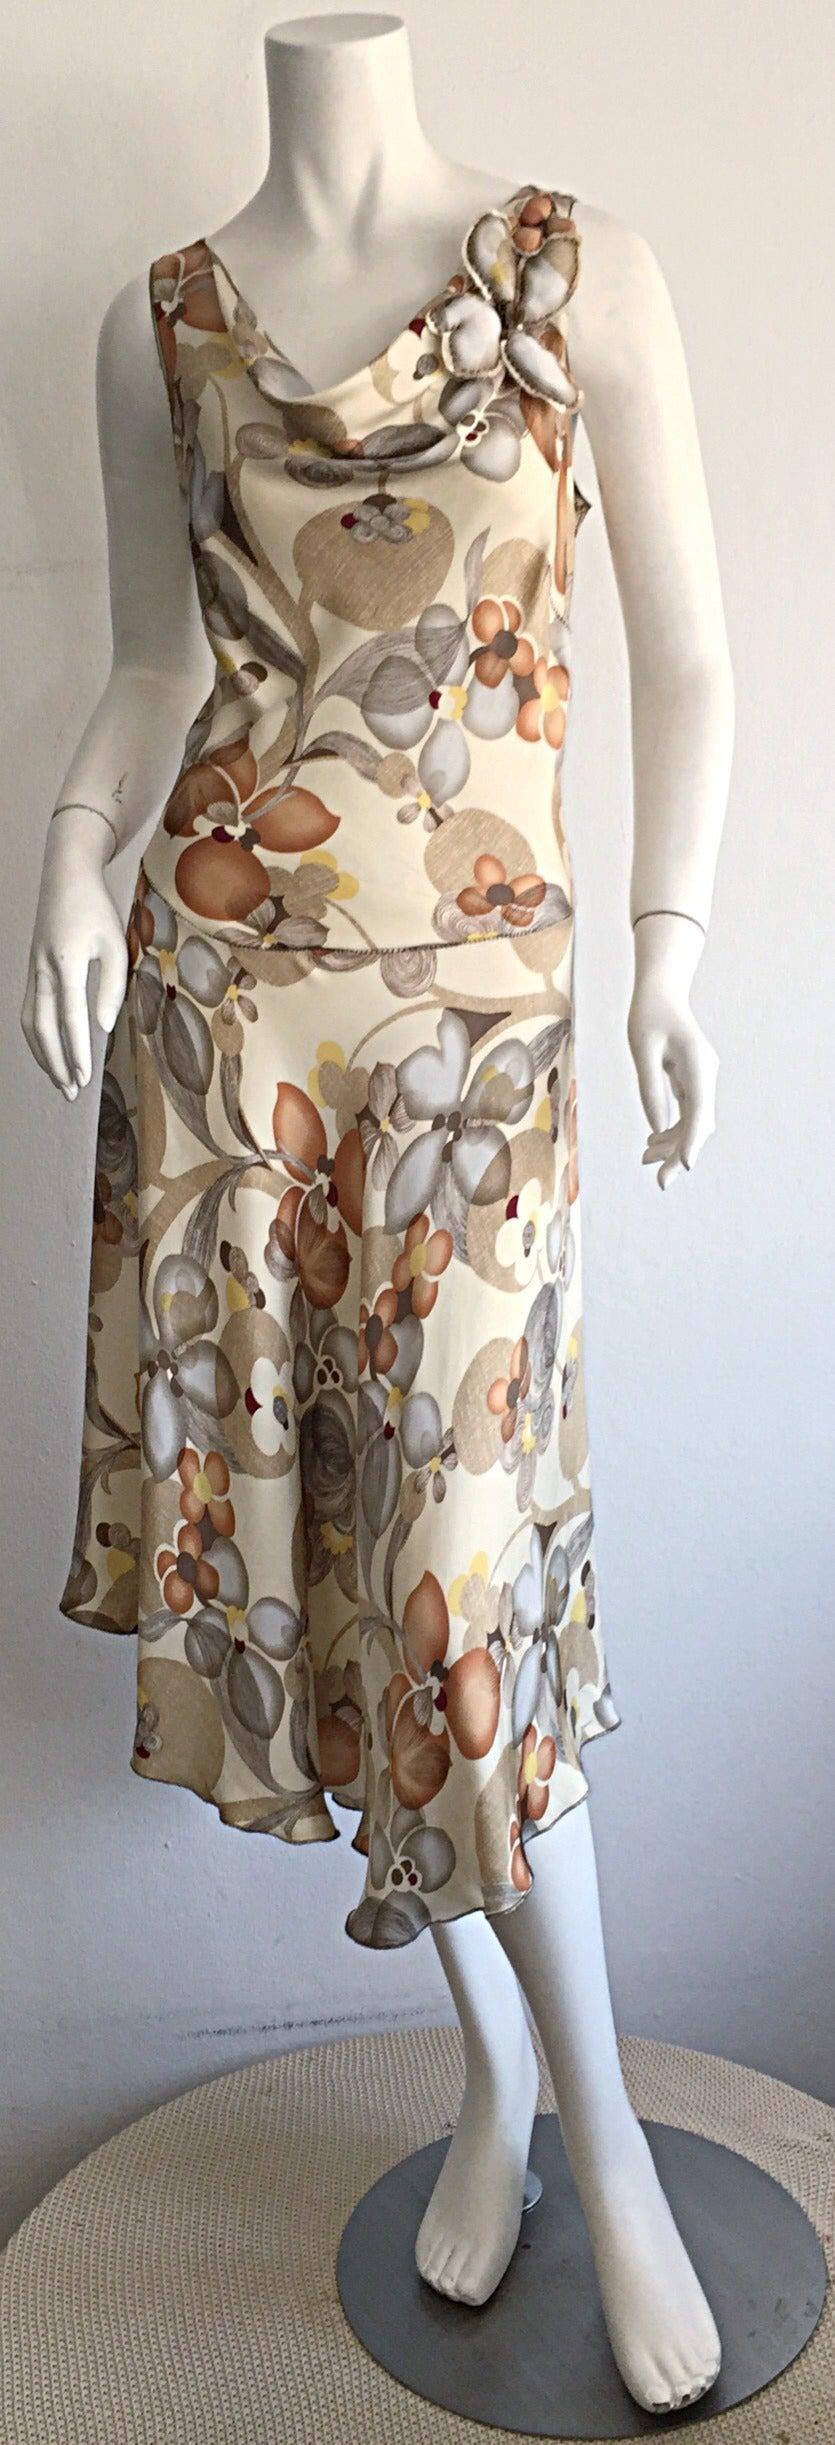 Pretty Silk Dress By Rozae Nichols Gorgeous Neutral Hues With A Unique Fl